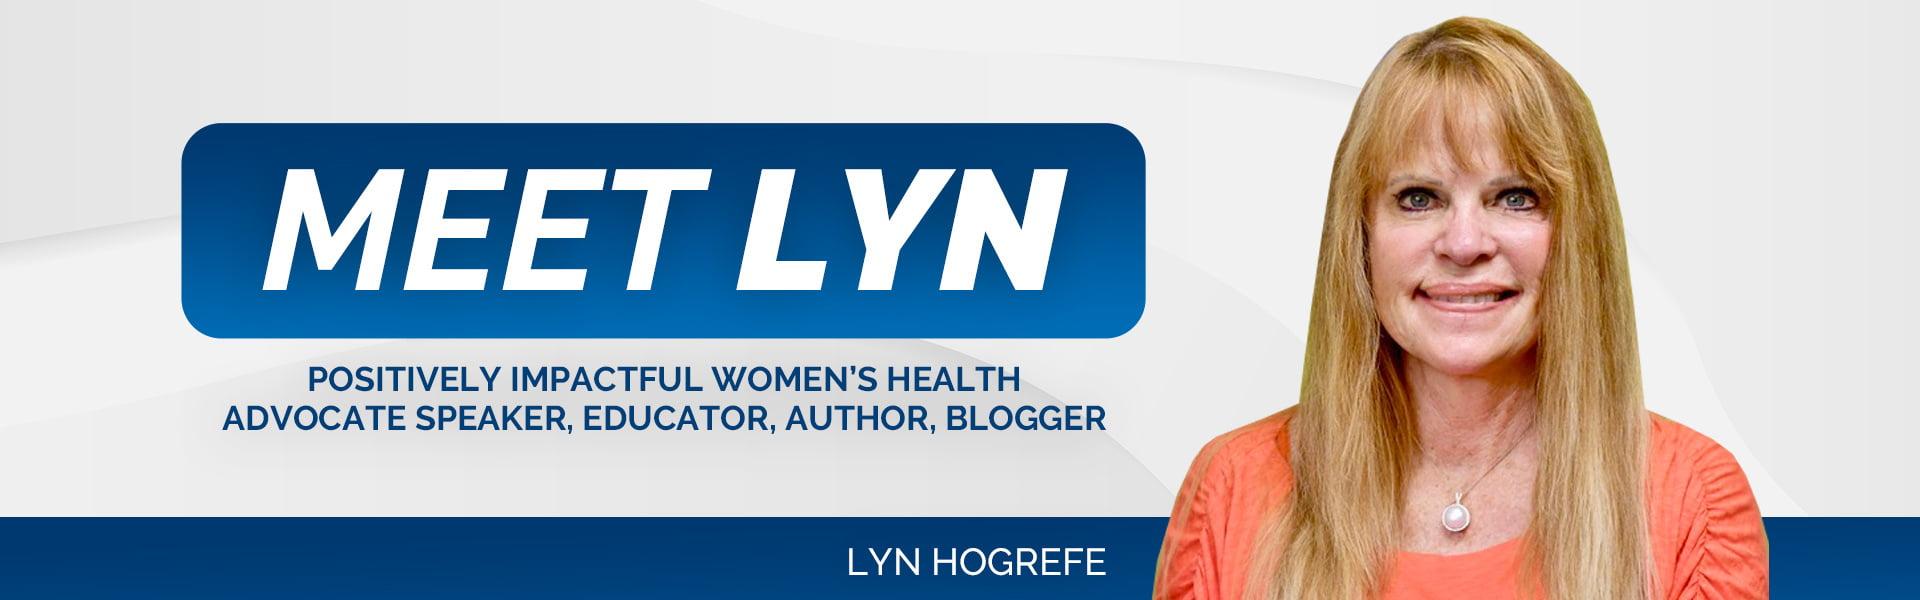 Meet LYN